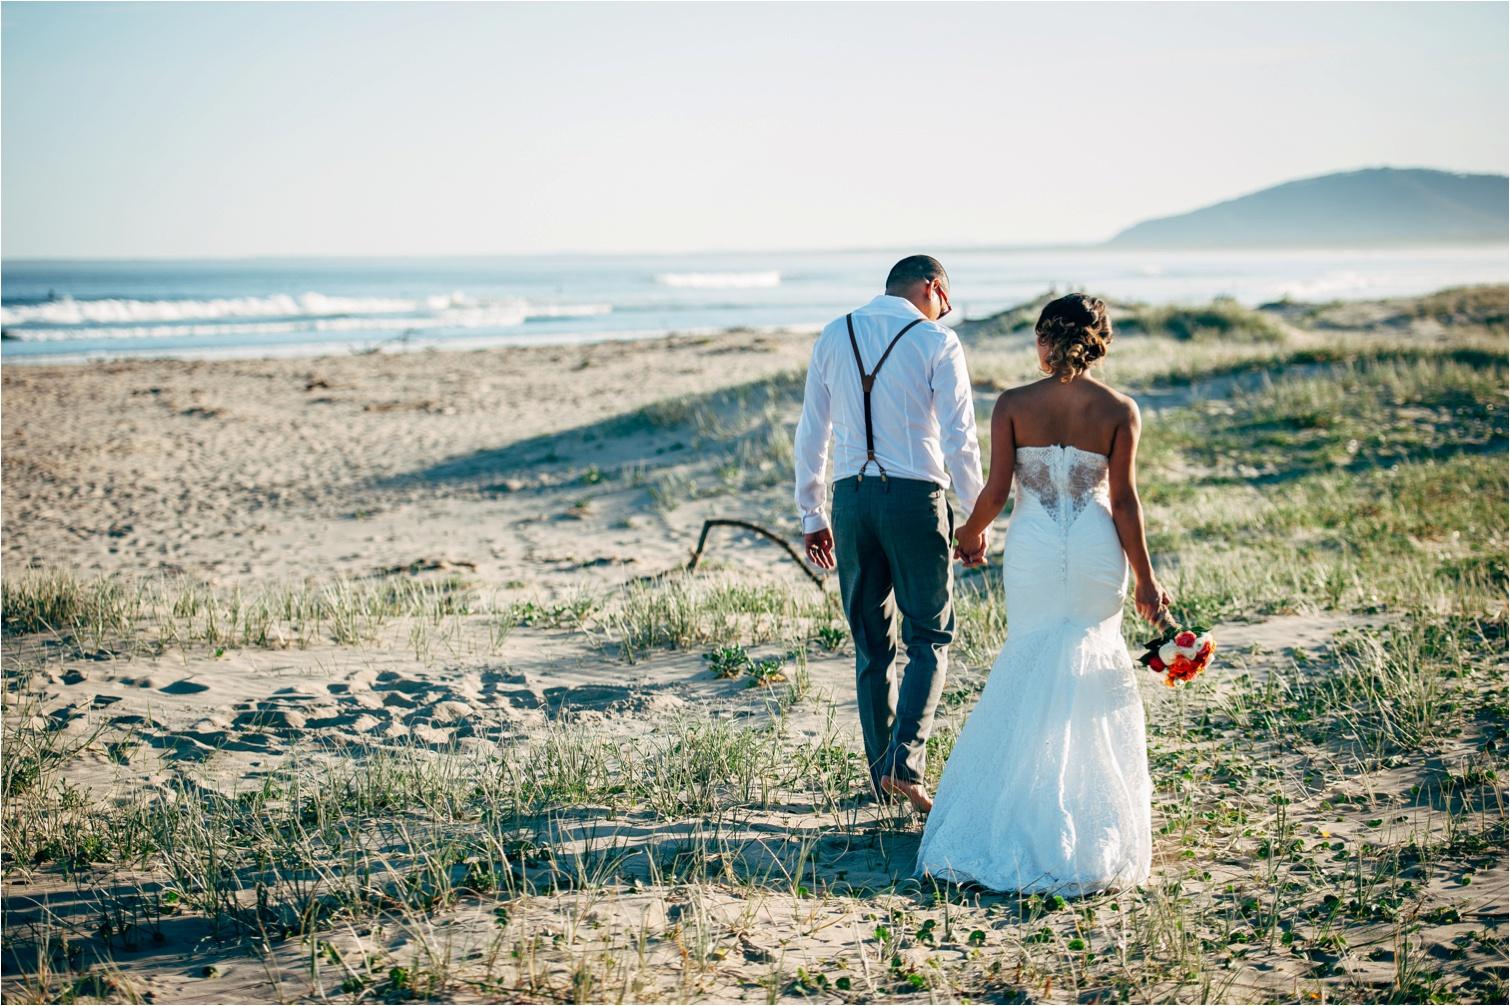 Gerrigong_Beach_Winery_Wedding-by_The_Follans_0040.jpg